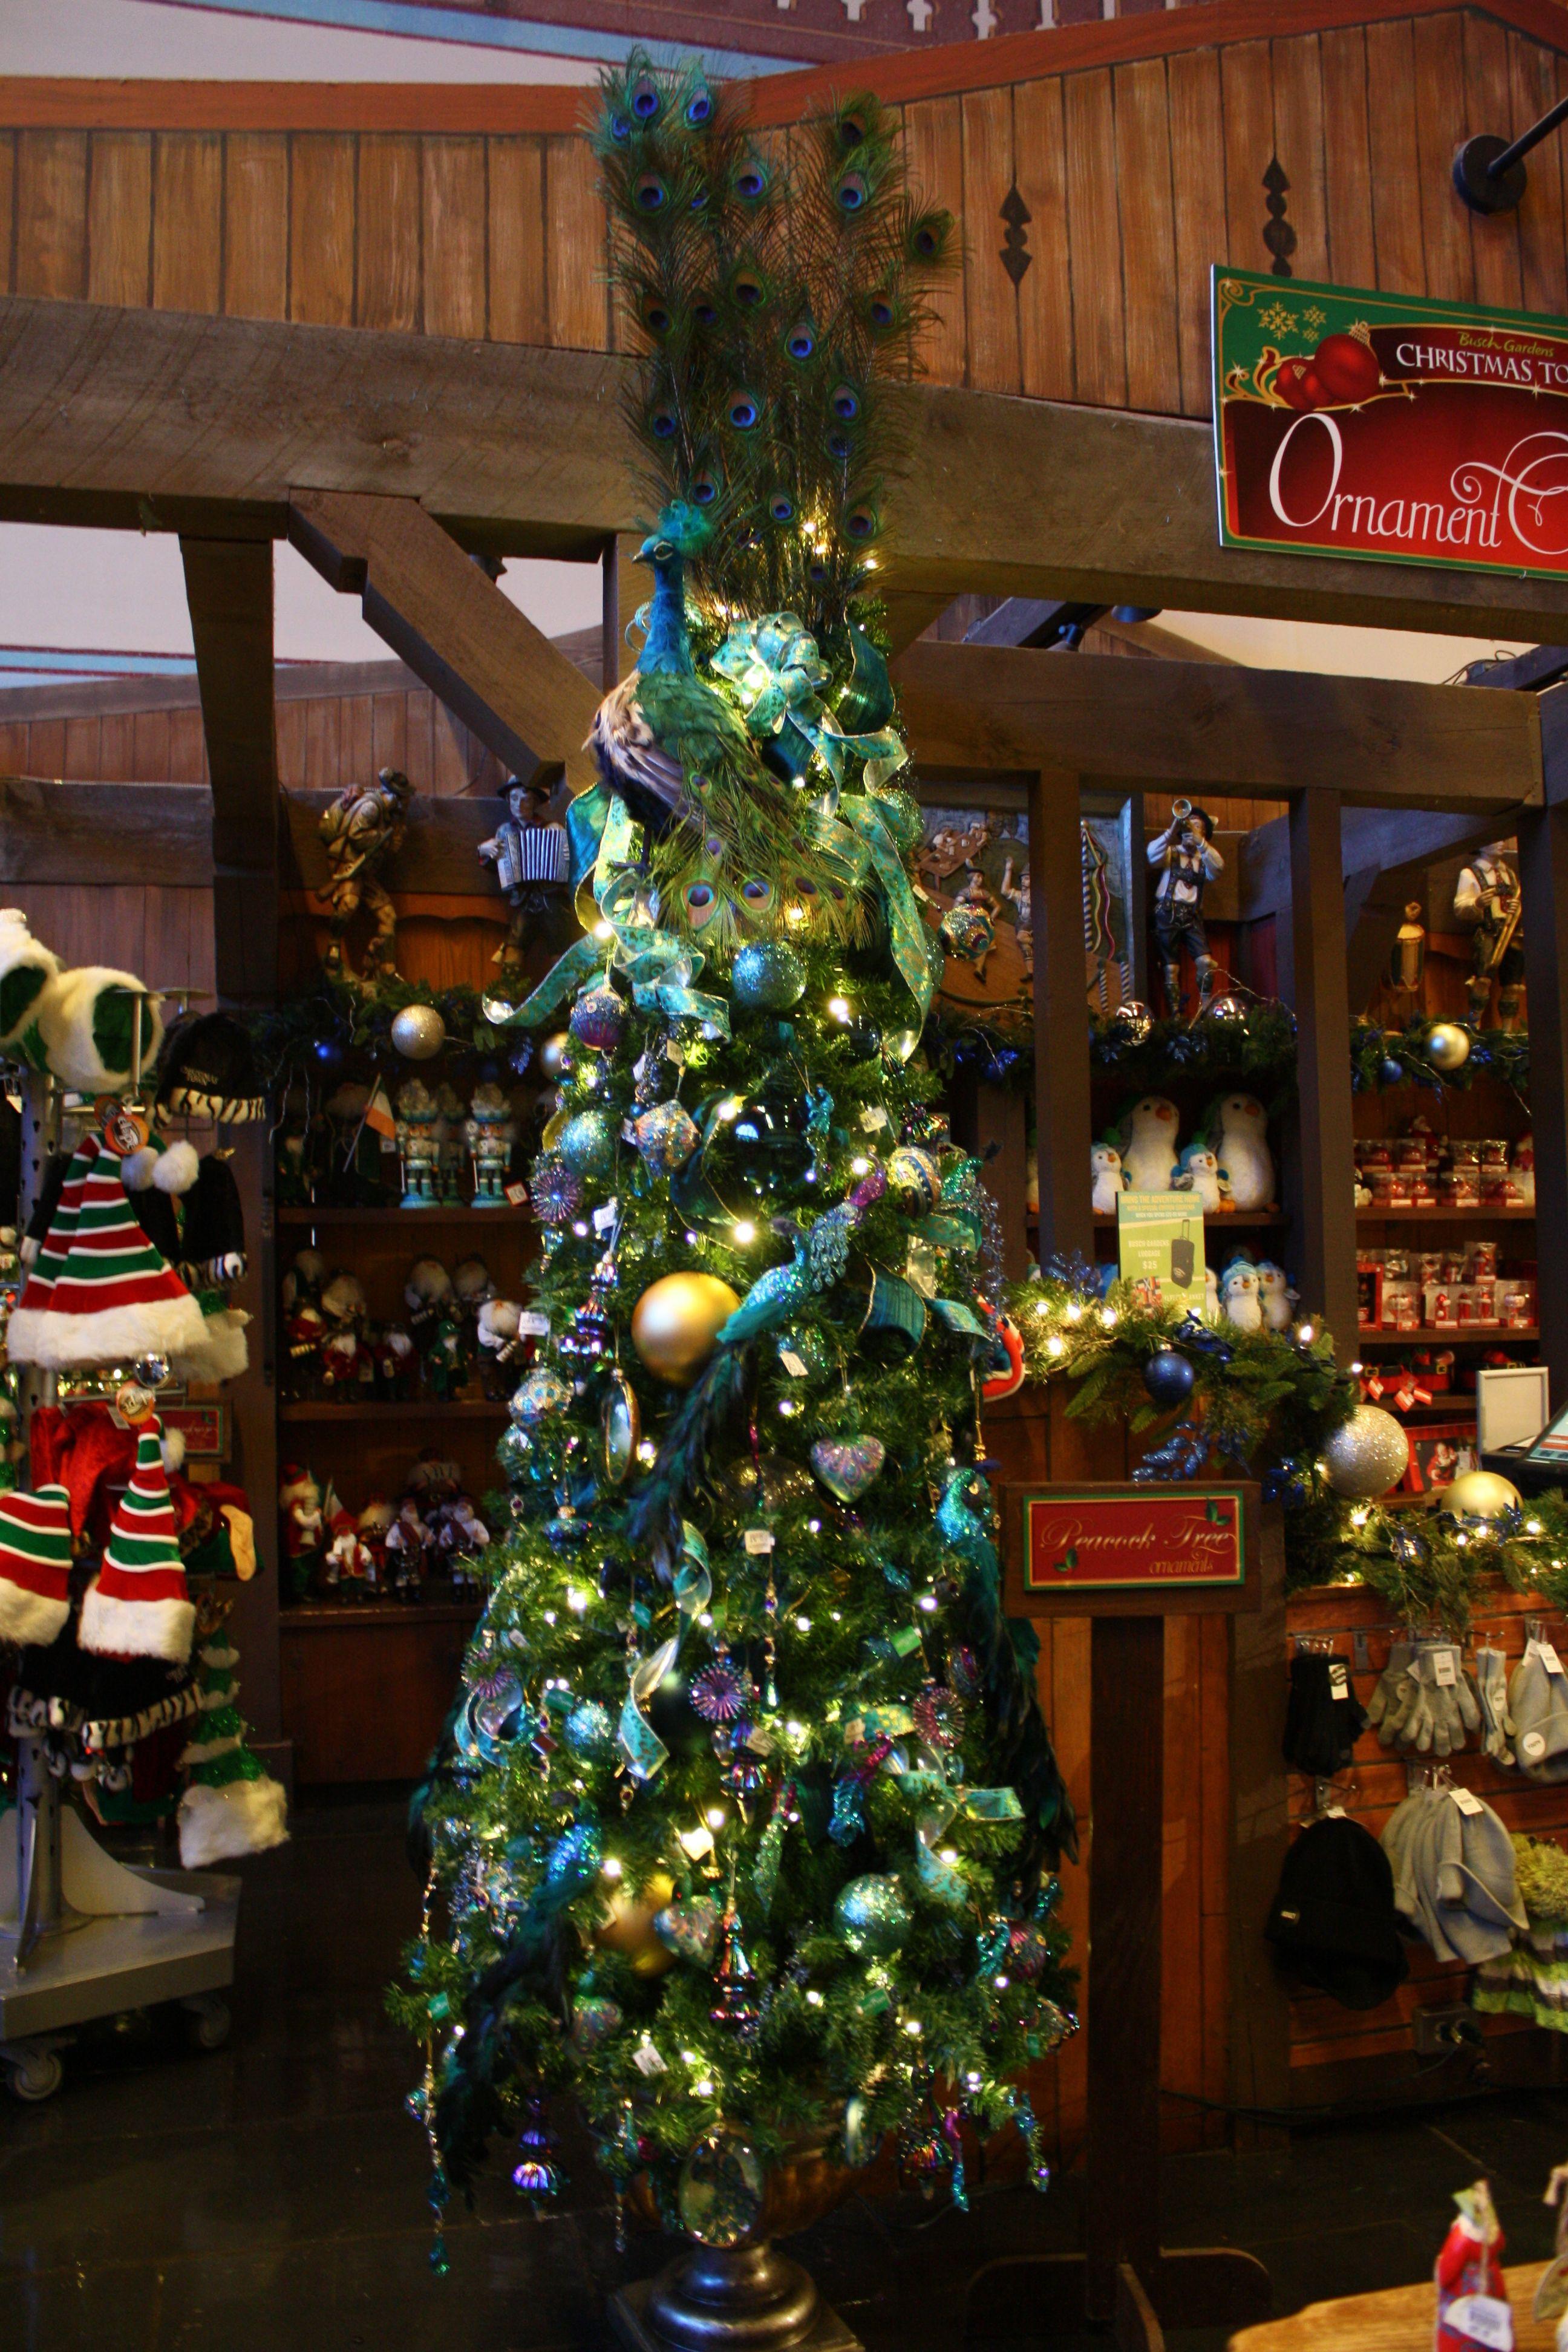 defa3c76bfdb1c236ec69b1e85fcfd65 - Busch Gardens Williamsburg Christmas Town Discount Tickets 2019